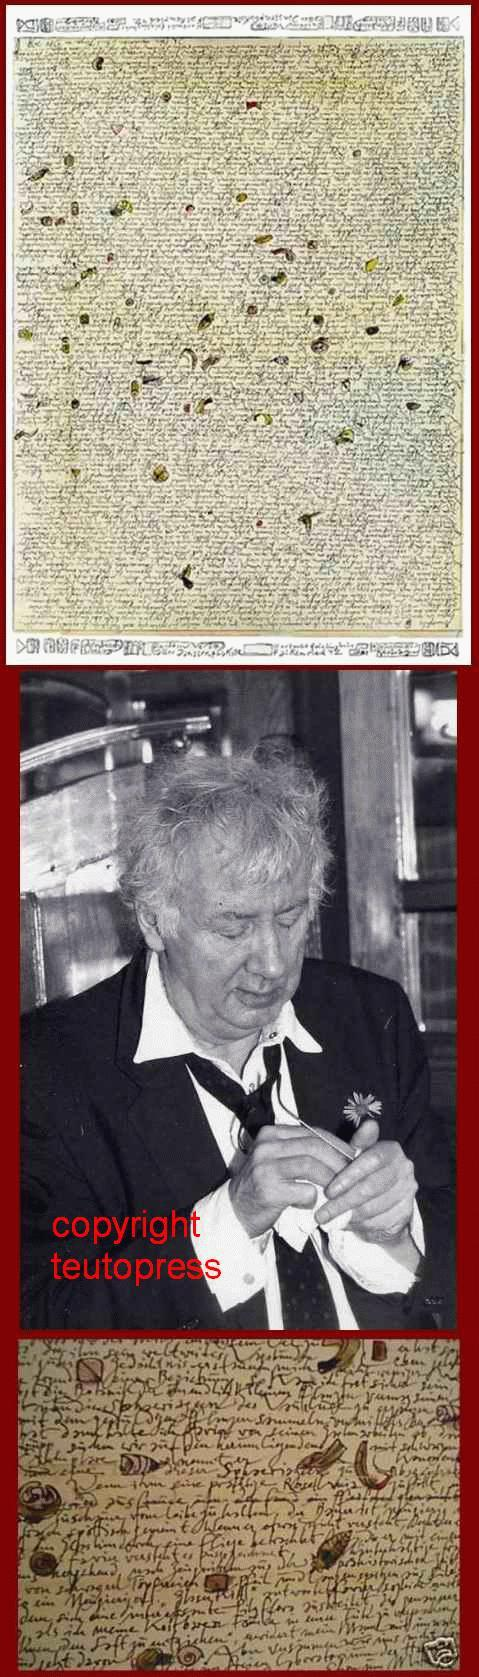 Horst Janssen - AMMOPHILA - handsigniertes Schriftblatt zu Das OFFENBARE GEHEIMNIS 1980 + OriginalFotoPortrait 1991 kopen? Bied vanaf 84!